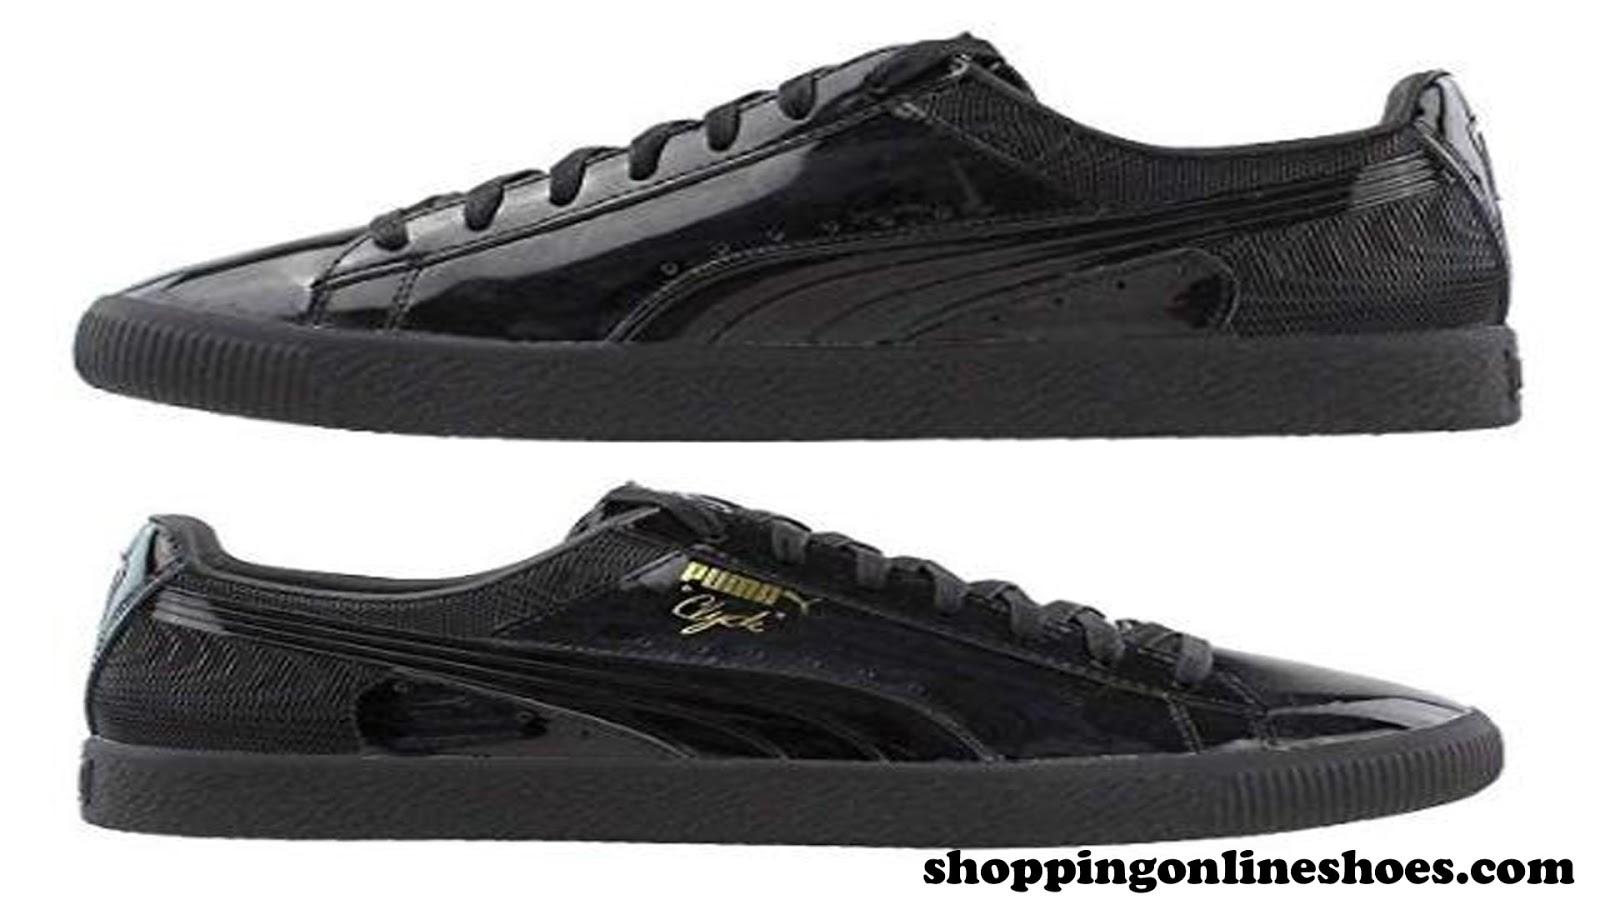 Puma Shoes For Men Black PUMA New Shoes Mens Shopping Online